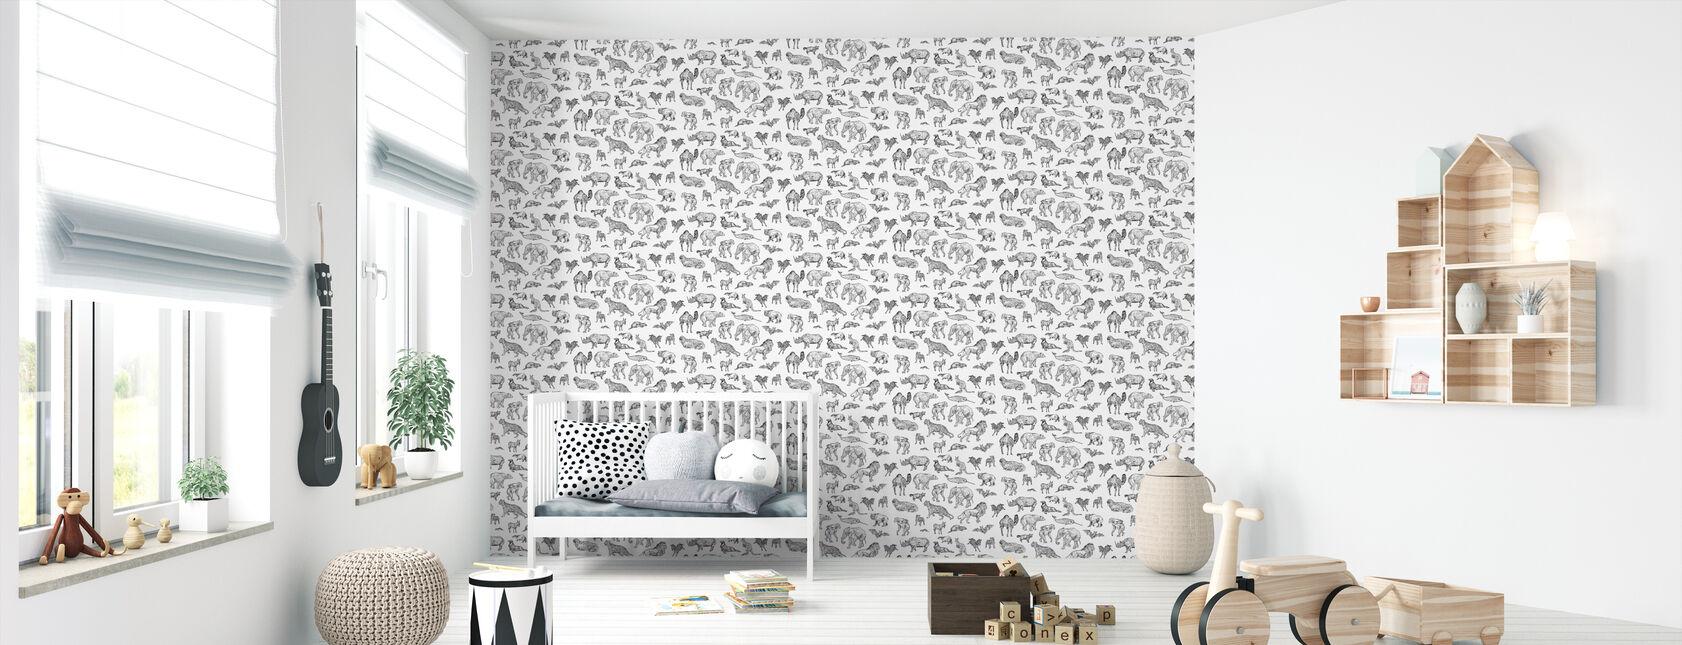 Lots of Animals Old School - Wallpaper - Nursery